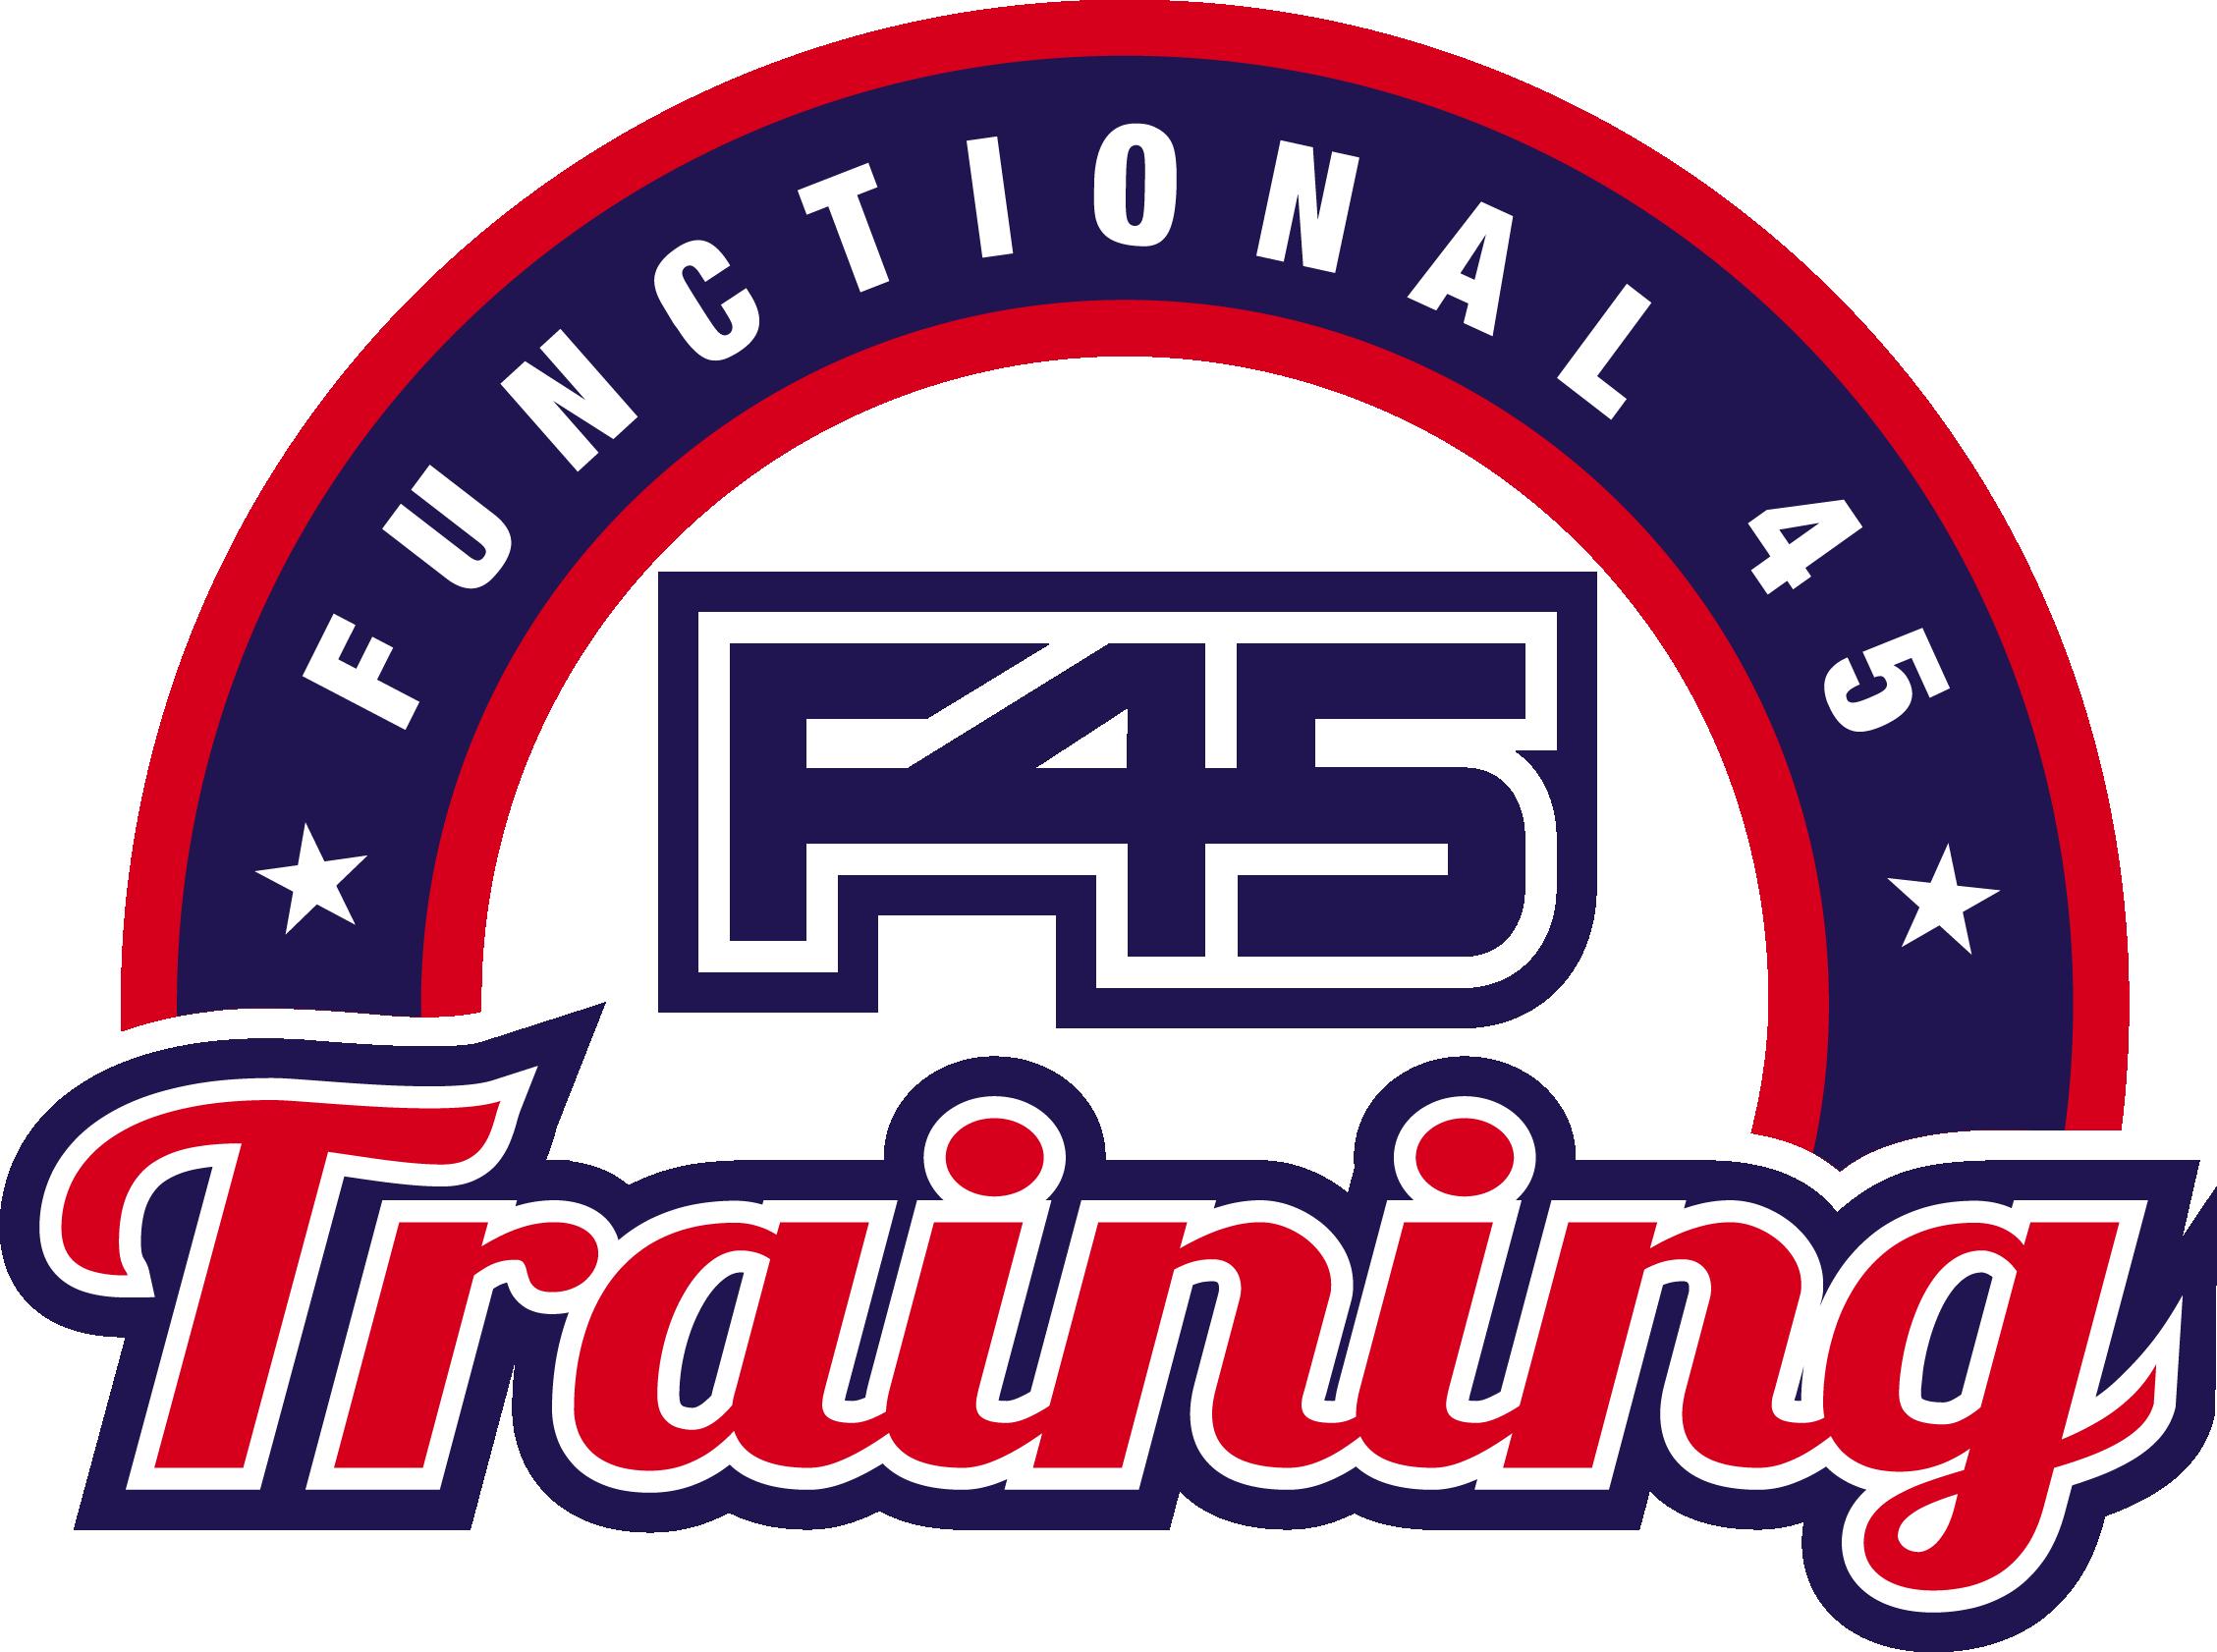 F45 Training